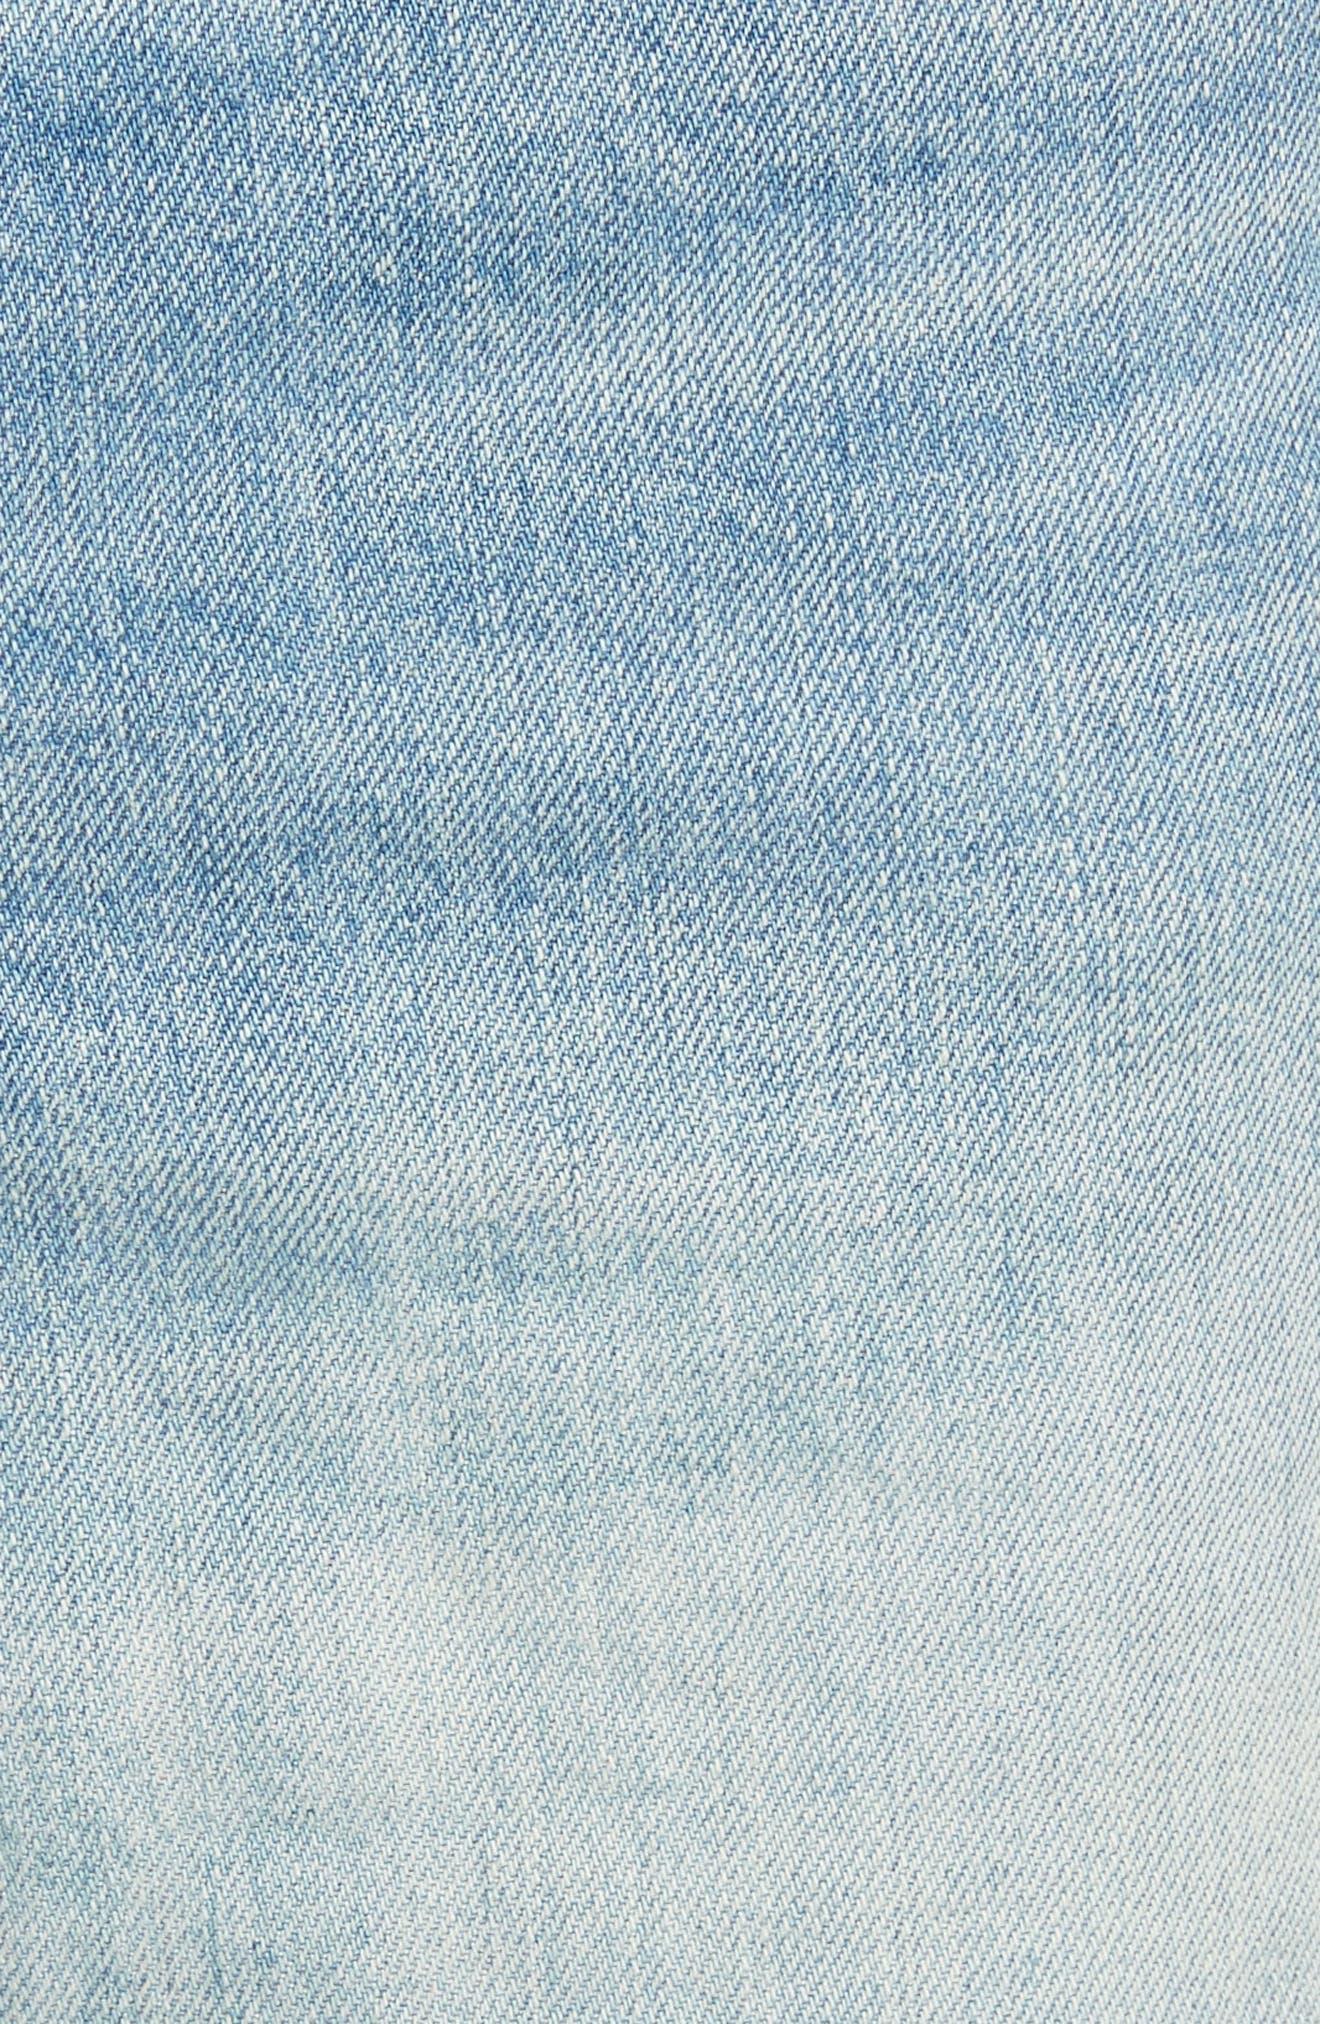 Justine High Waist Cutoff Denim Shorts,                             Alternate thumbnail 5, color,                             450